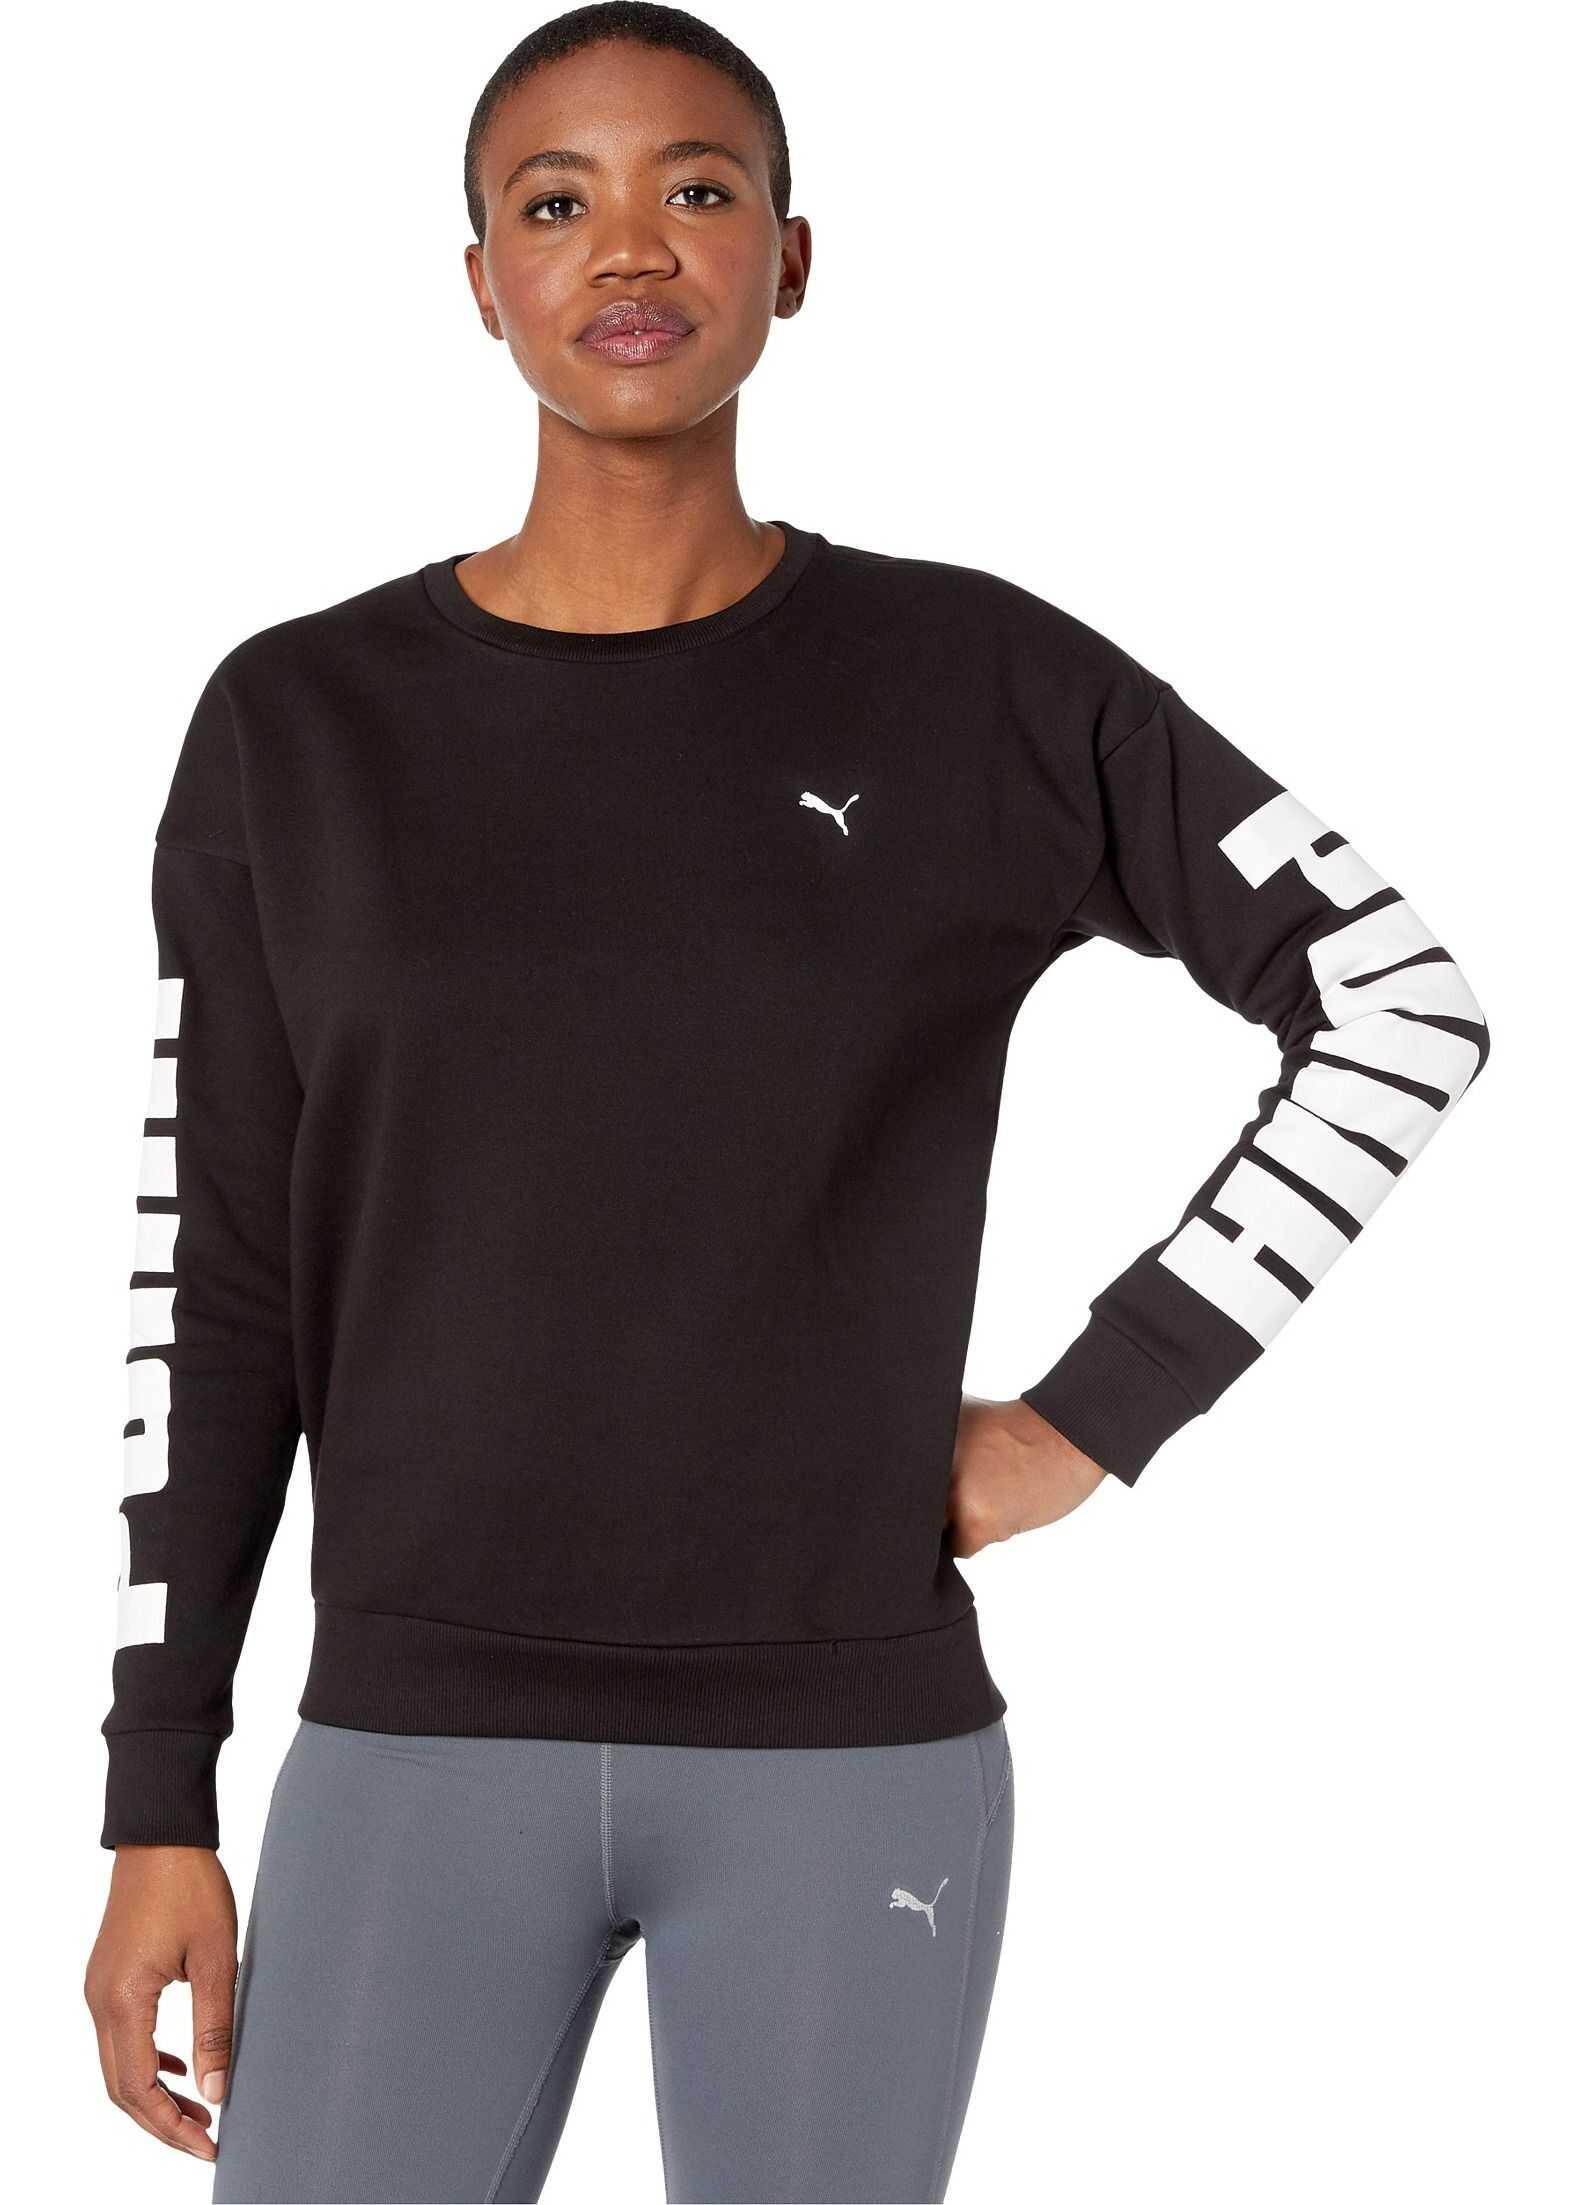 PUMA Rebel Fleece Crew Sweatshirt PUMA Black